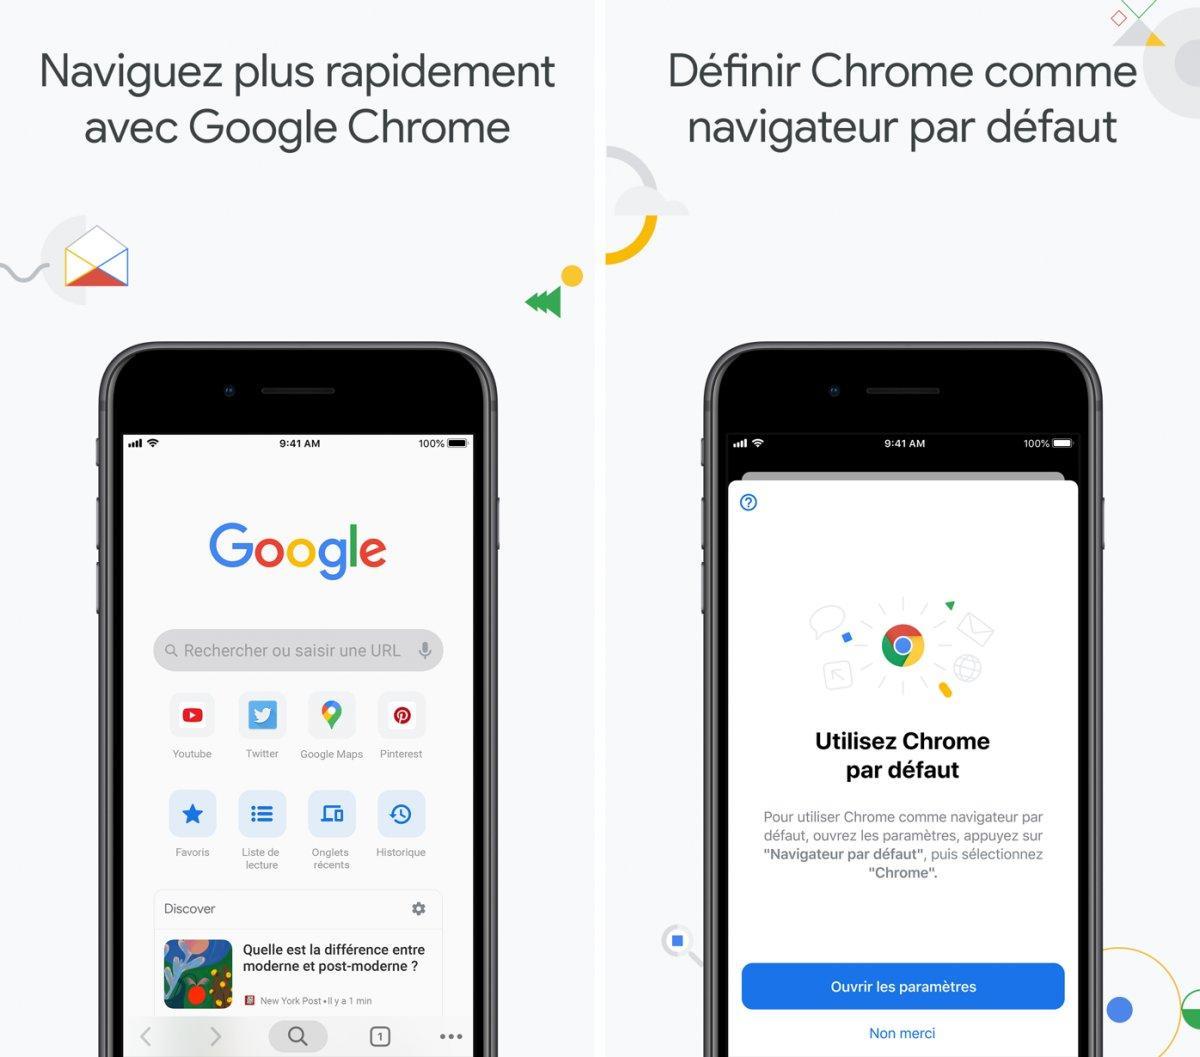 google chrome app capture ipa iphone ipad